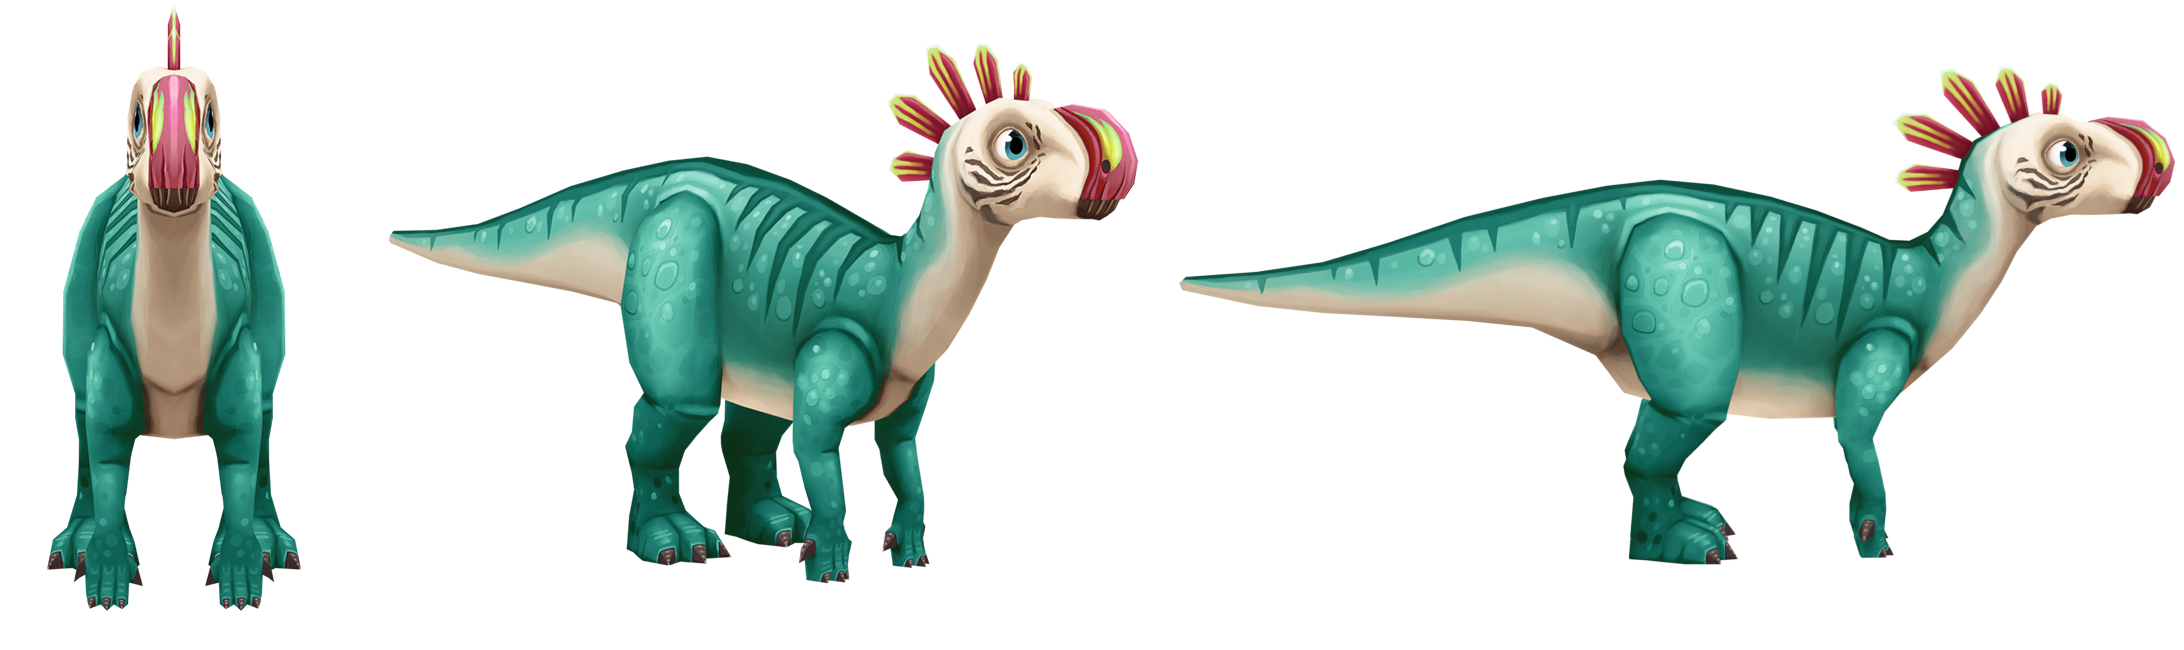 Altirhinus and Bambiraptor